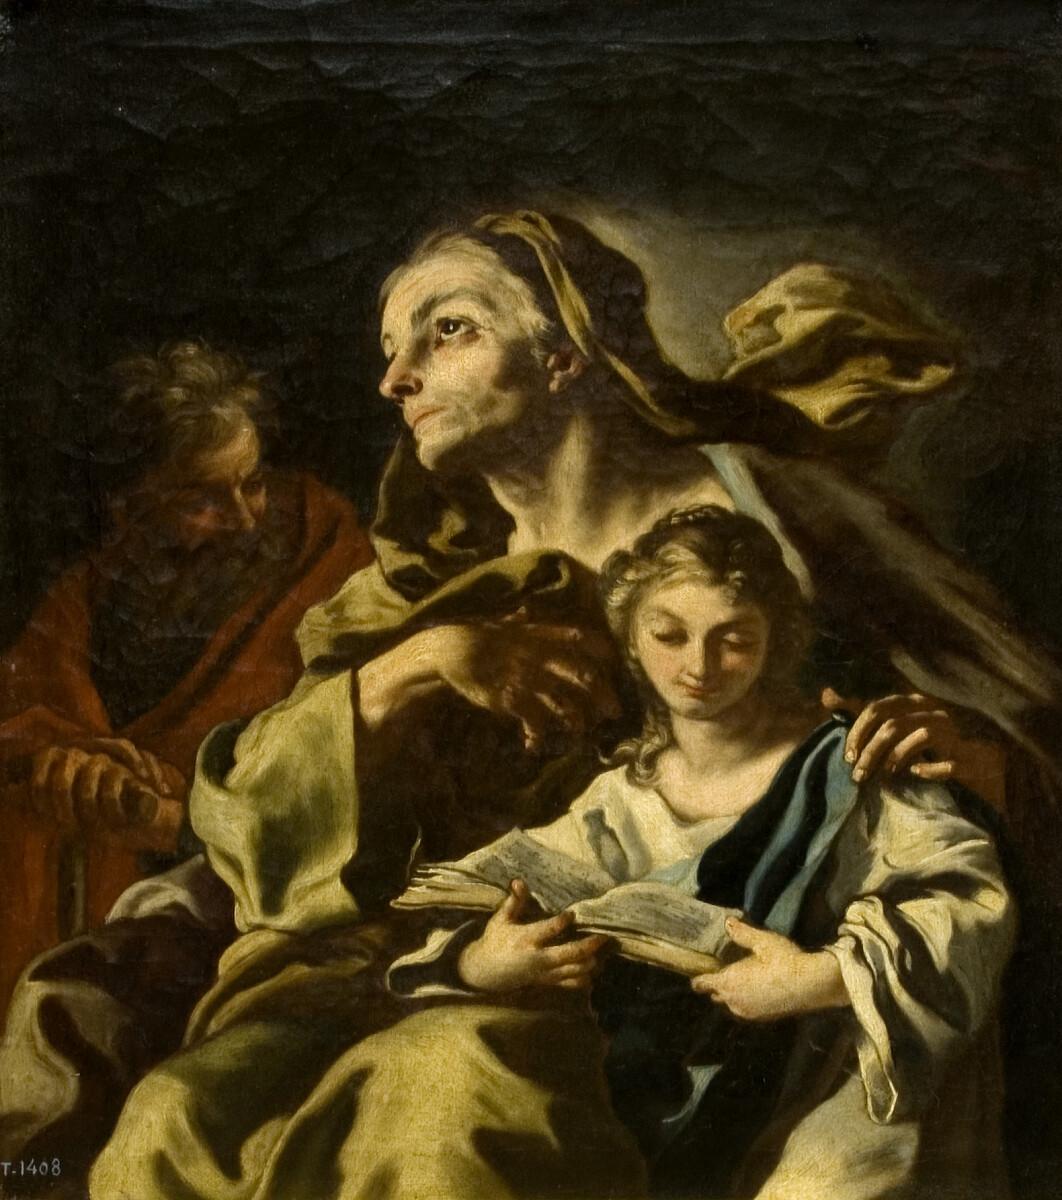 Sant Joaquim, Santa Anna i la Mare de Déu - Creative Commons - Public Domain - Mark